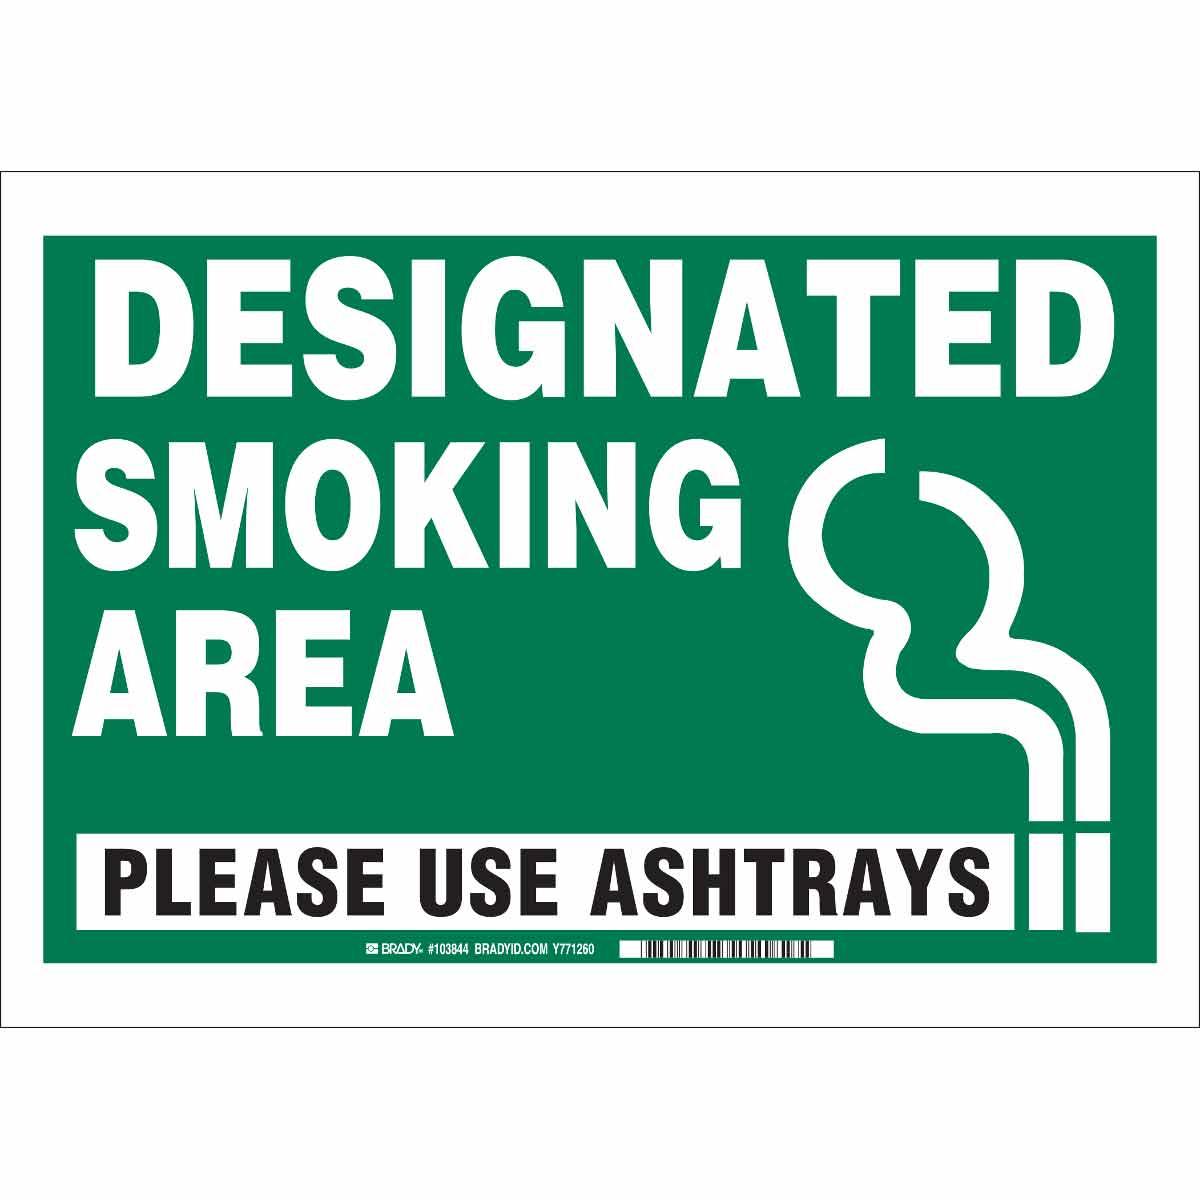 Brady Part 103844 Designated Smoking Area Please Use Ashtrays Sign Bradyid Com,Nursing School T Shirt Designs